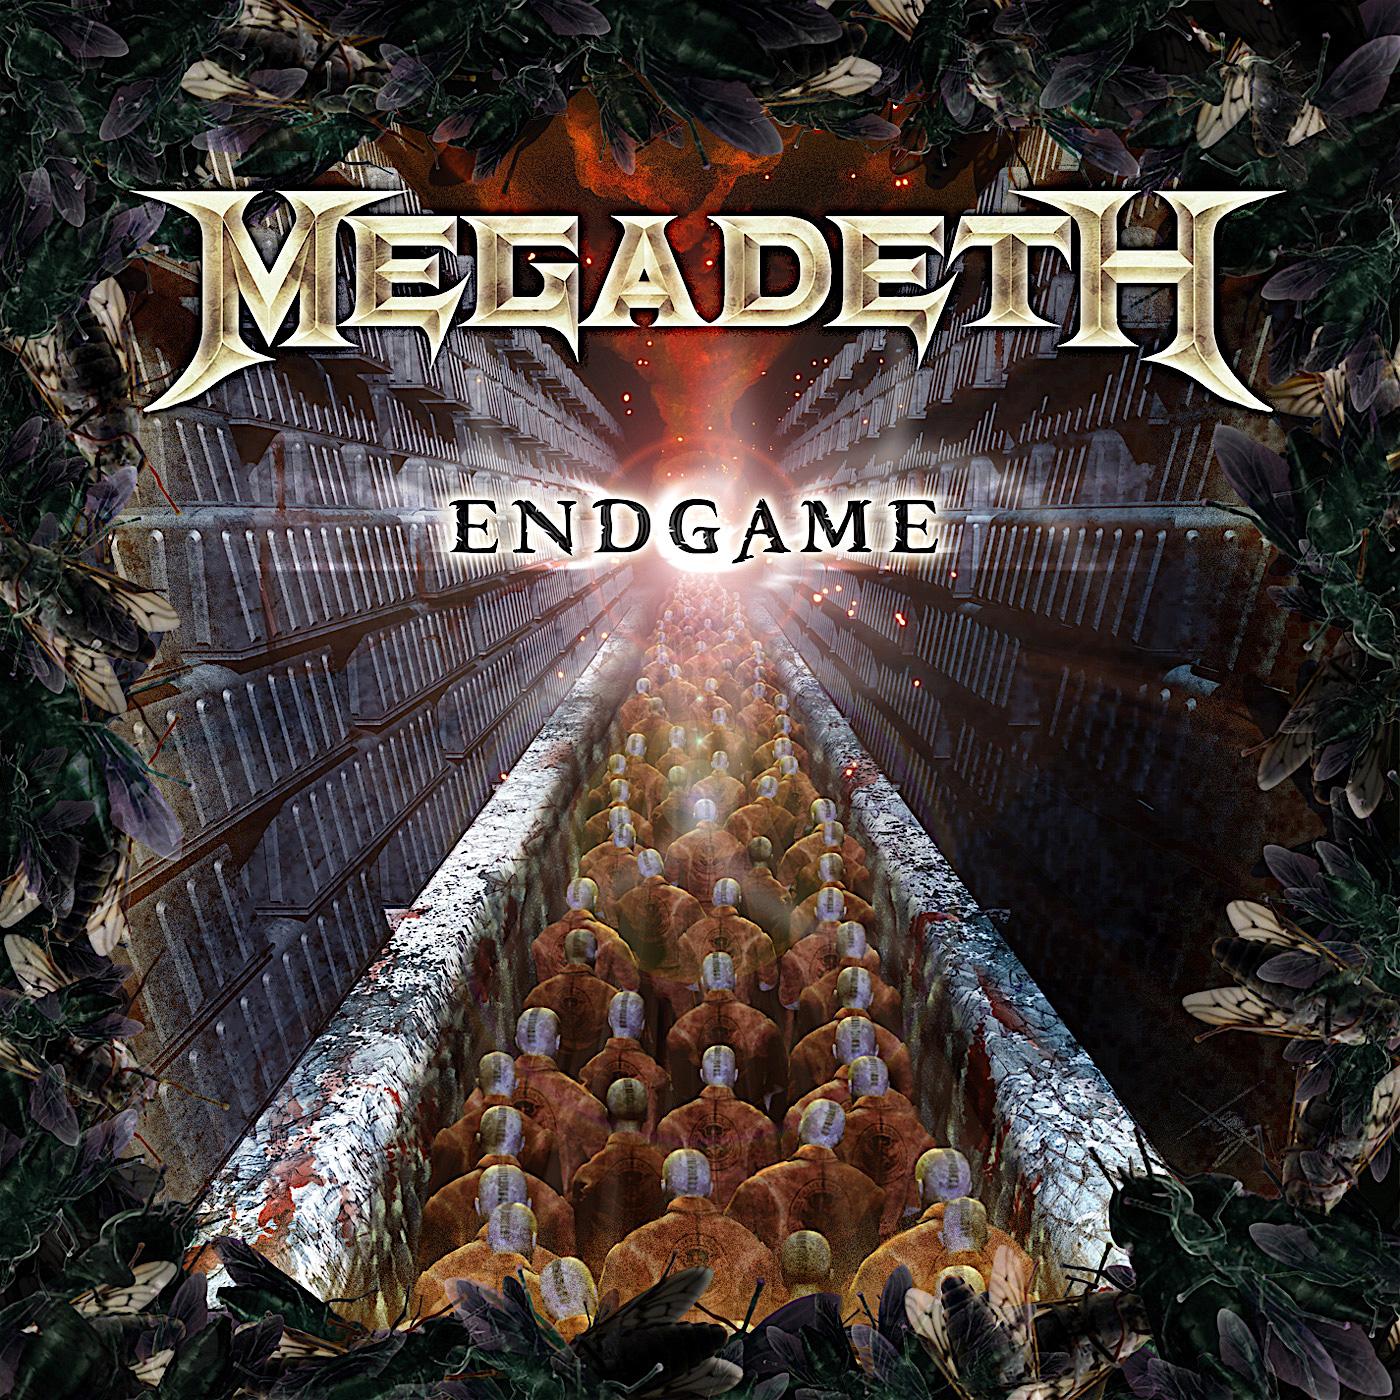 MEGADETH - Endgame cover